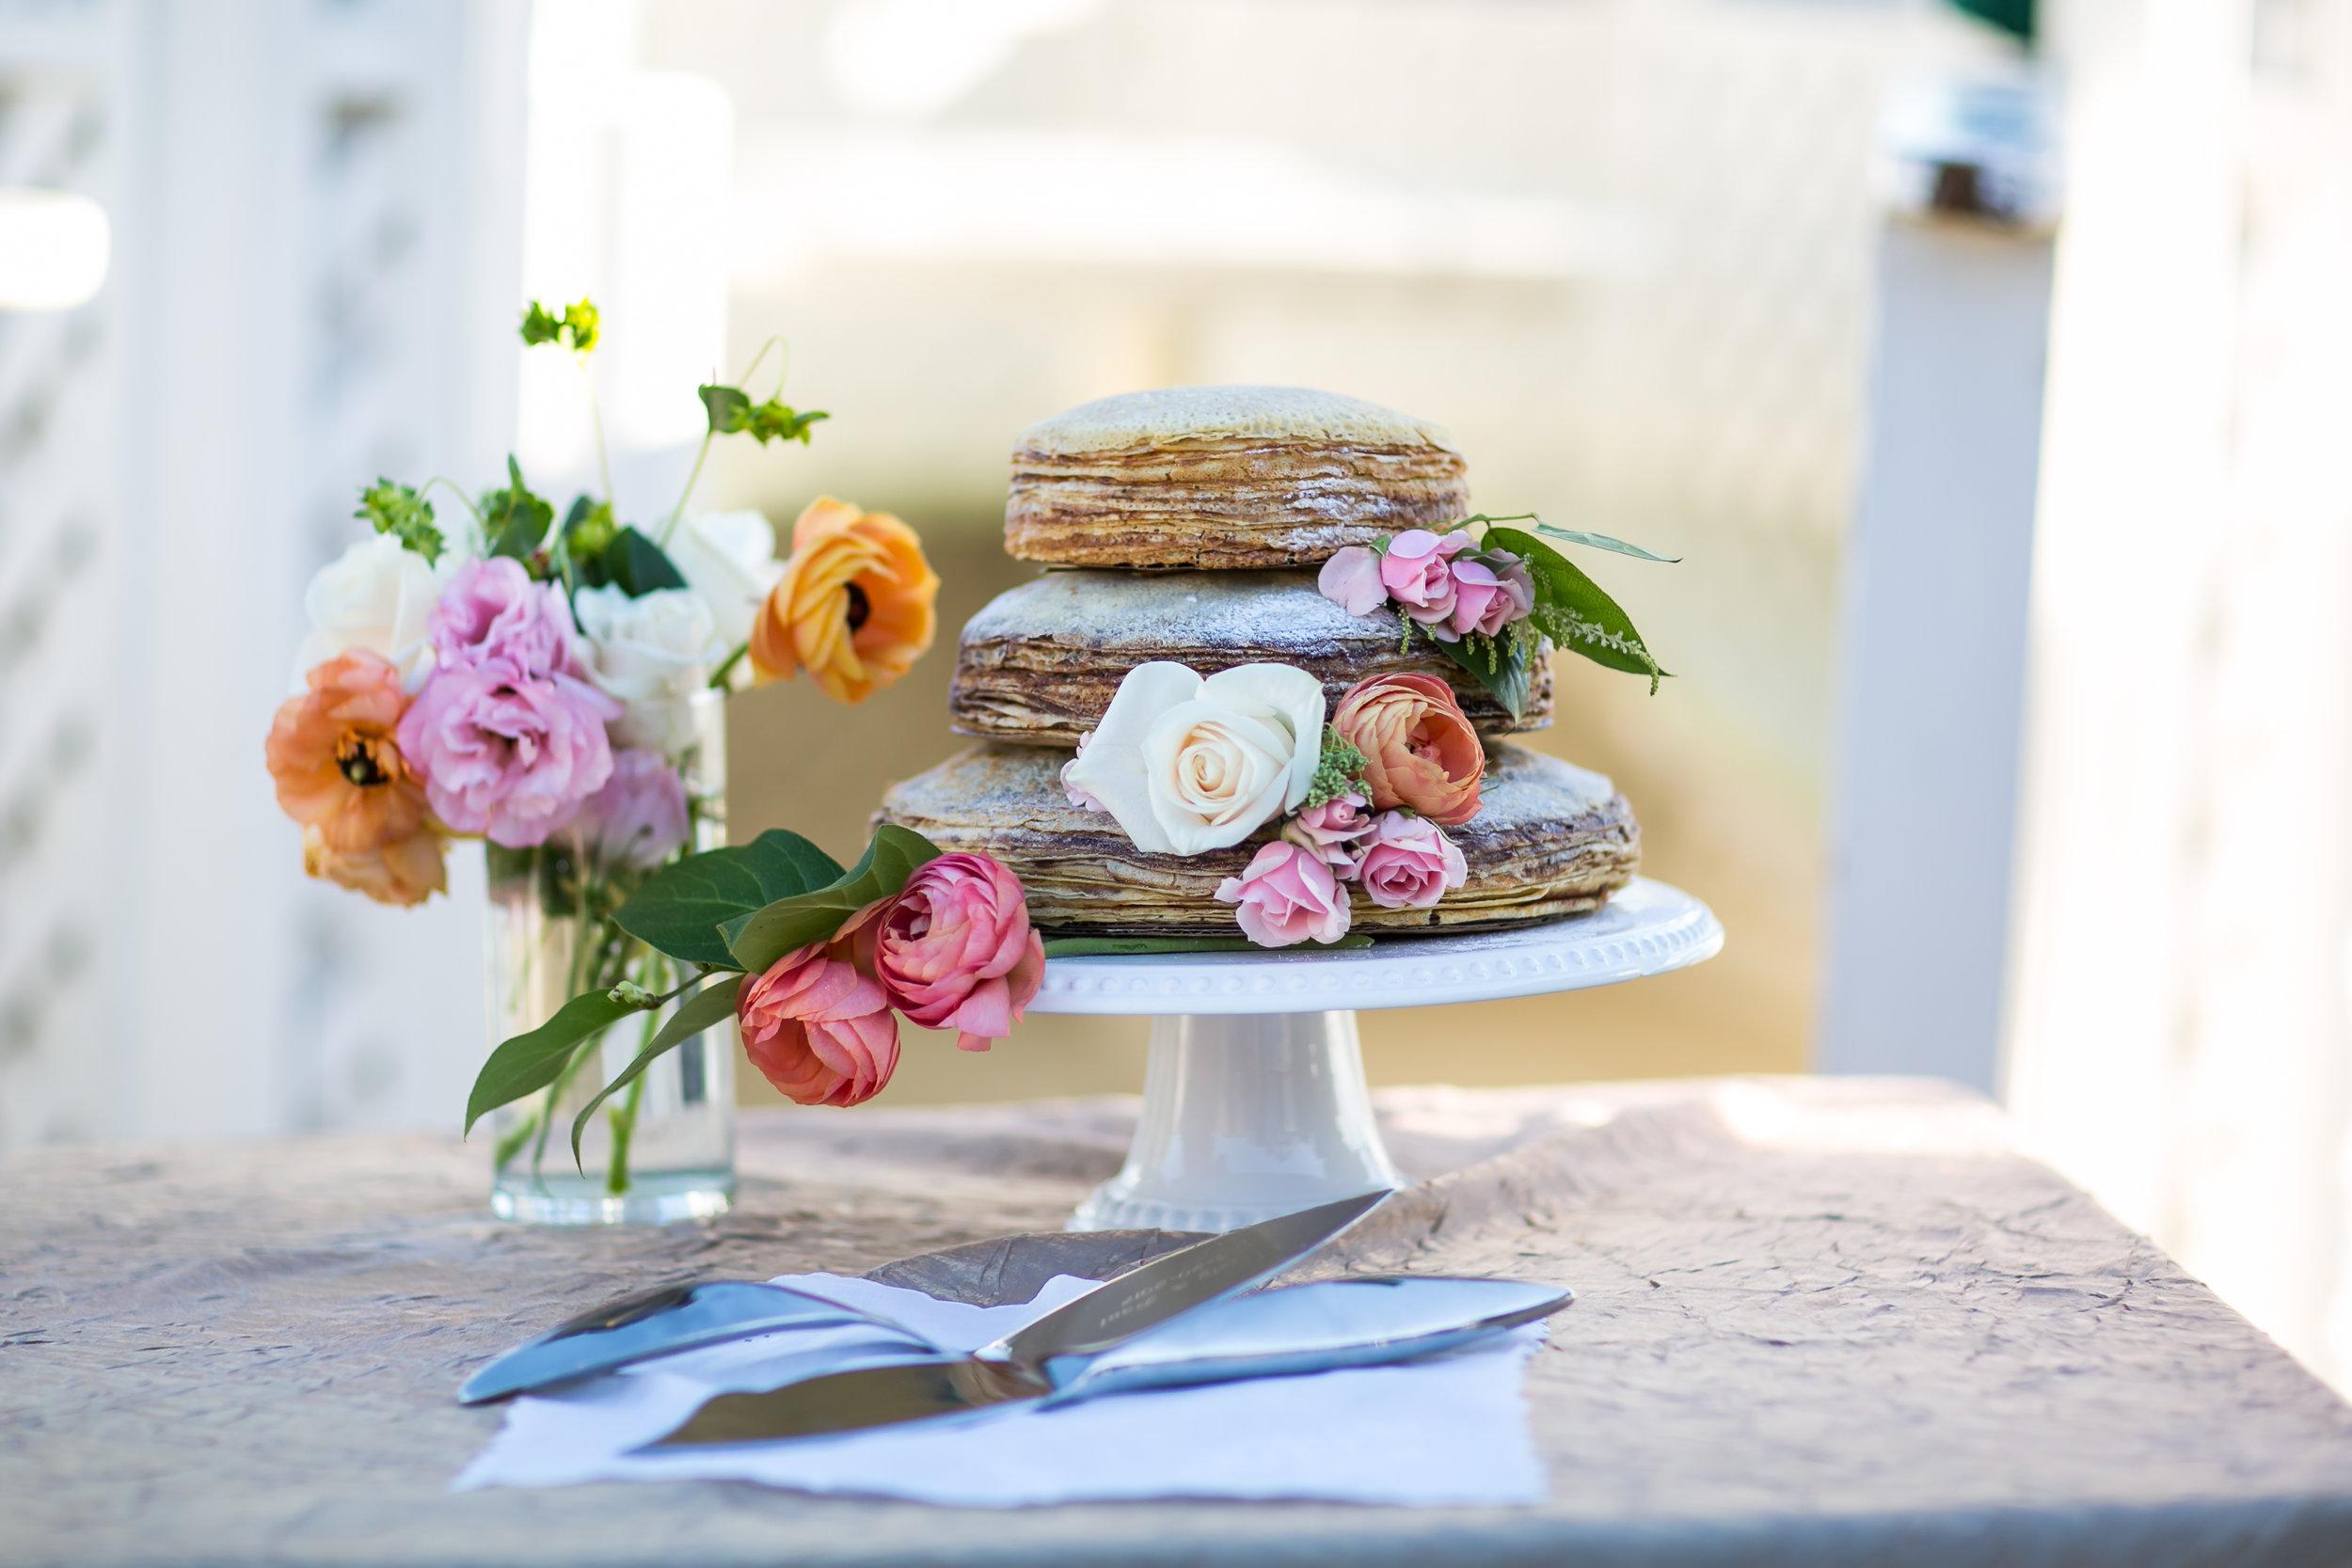 CRÊpe cake menu - a very special dessert, for a very special occasion